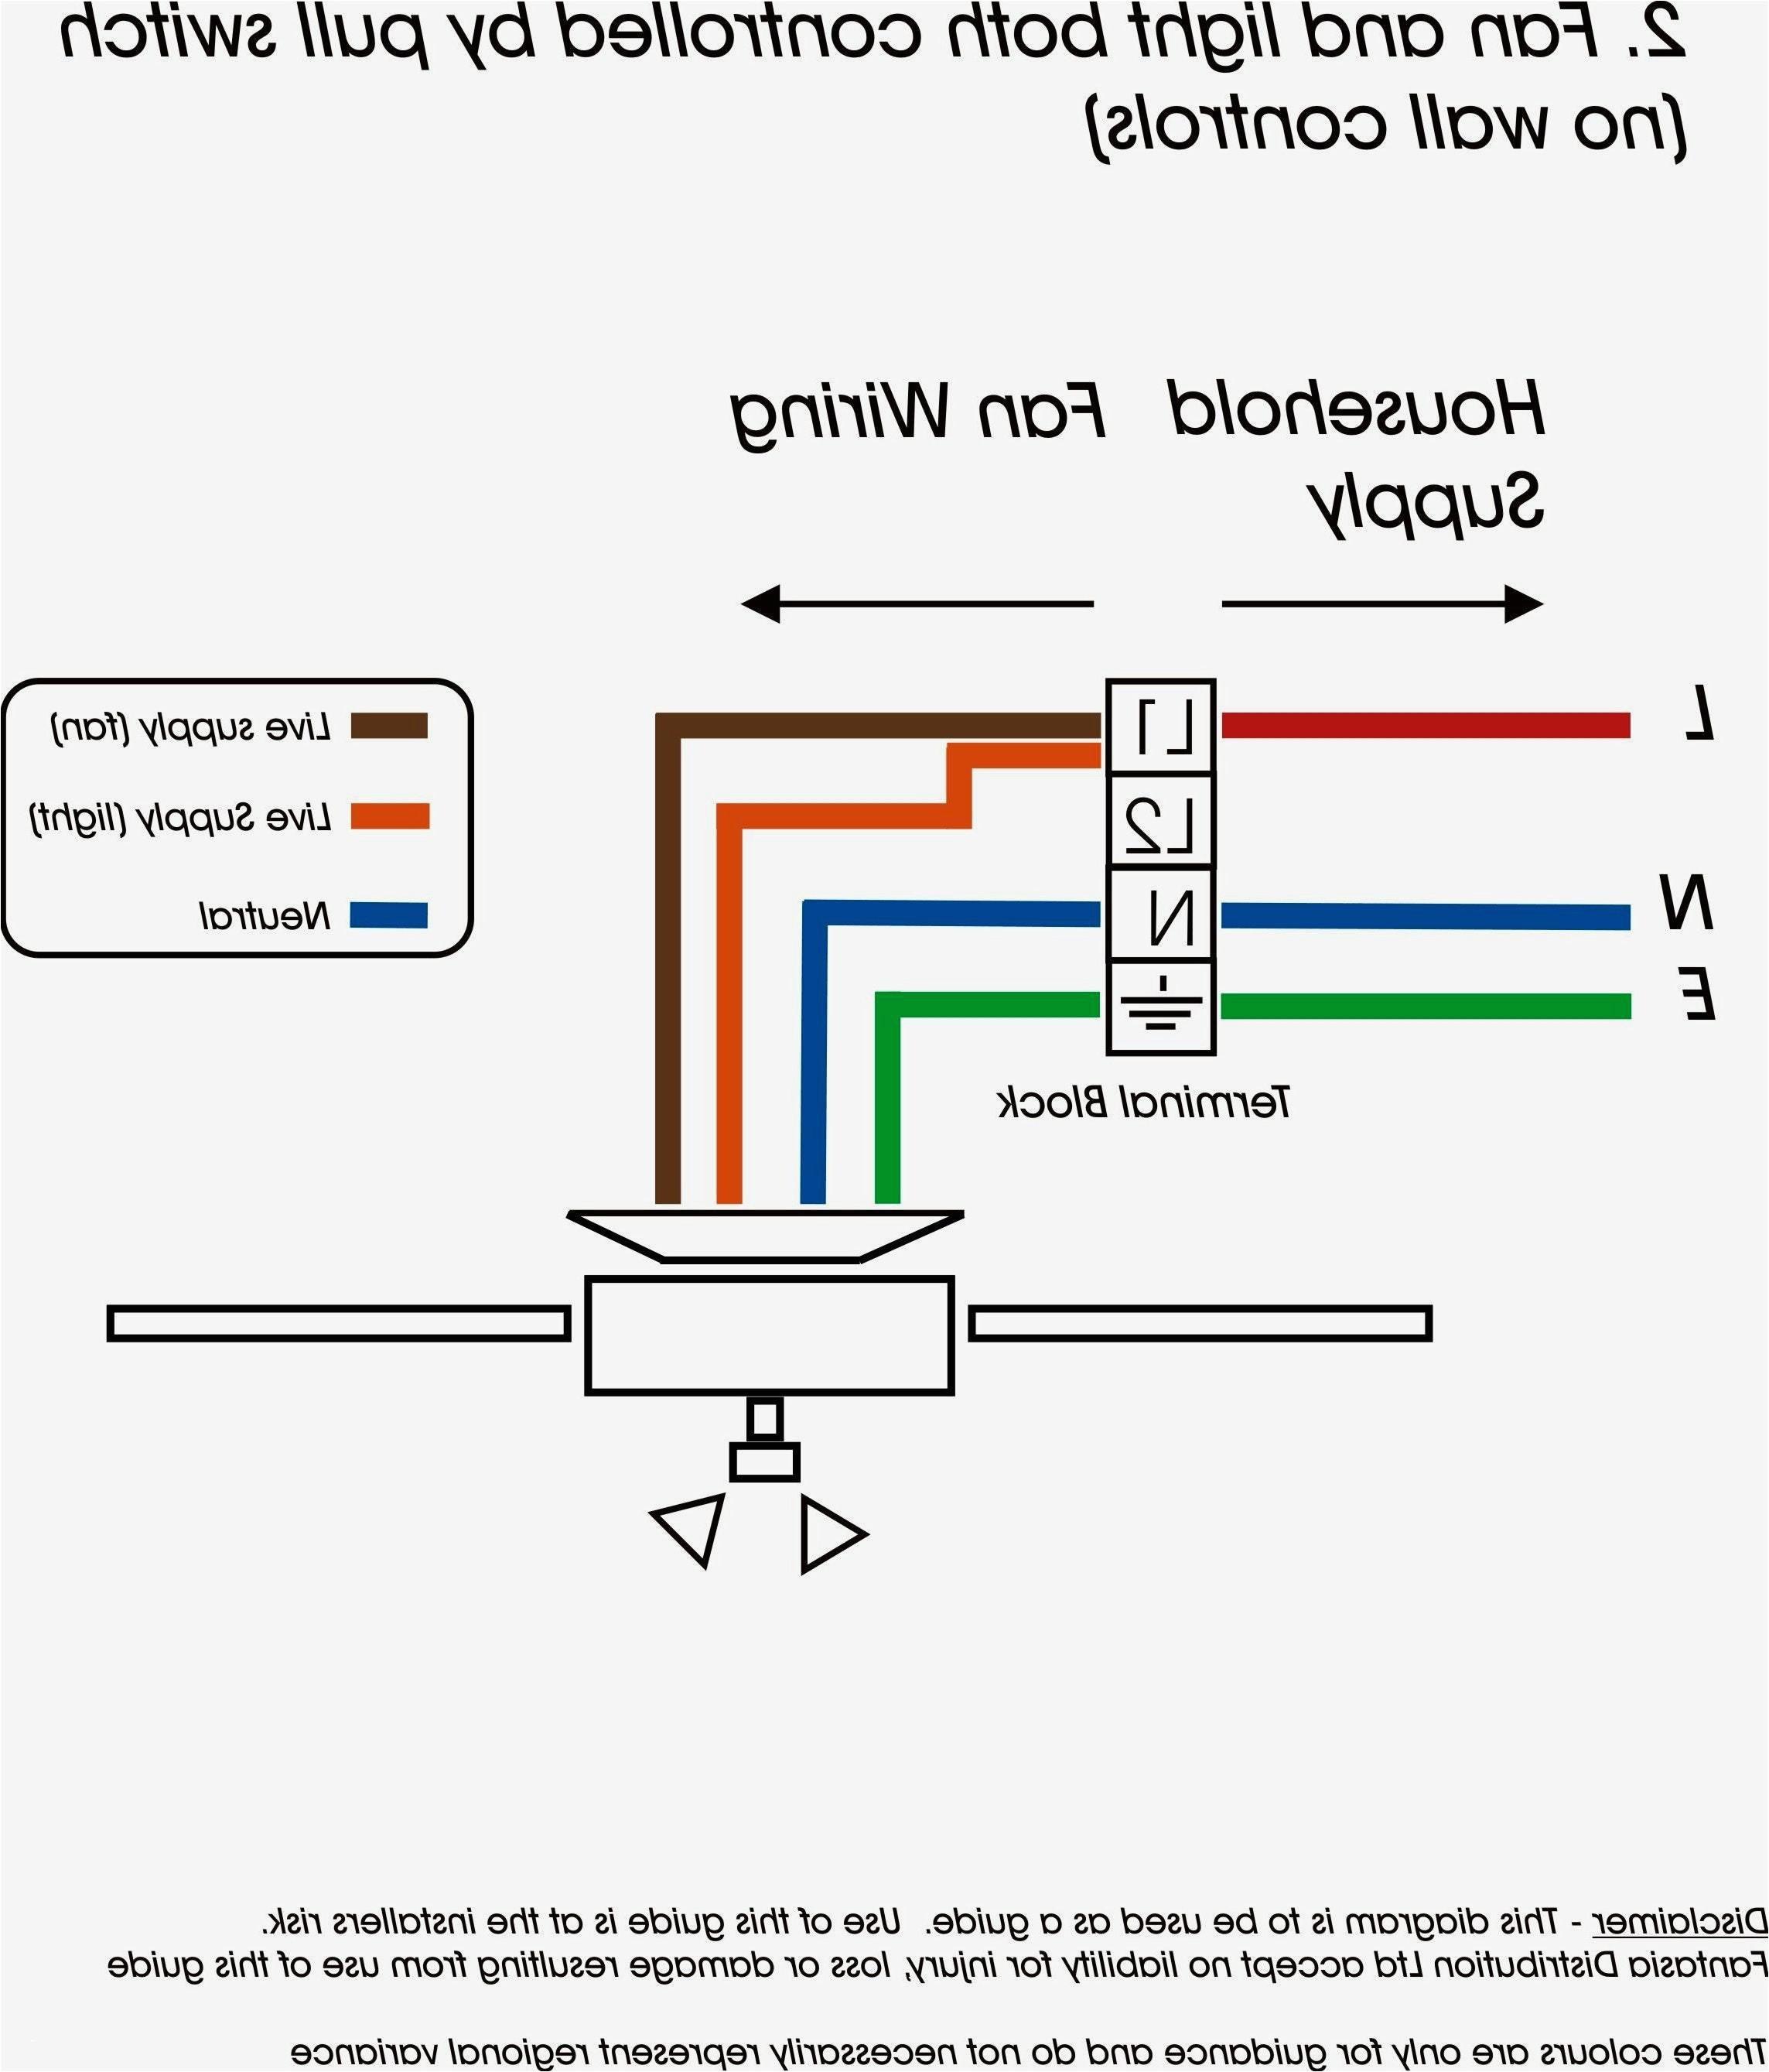 pioneer radio wiring diagram inspirational car stereo wiring diagrams free fresh wiring diagrams automotive image of